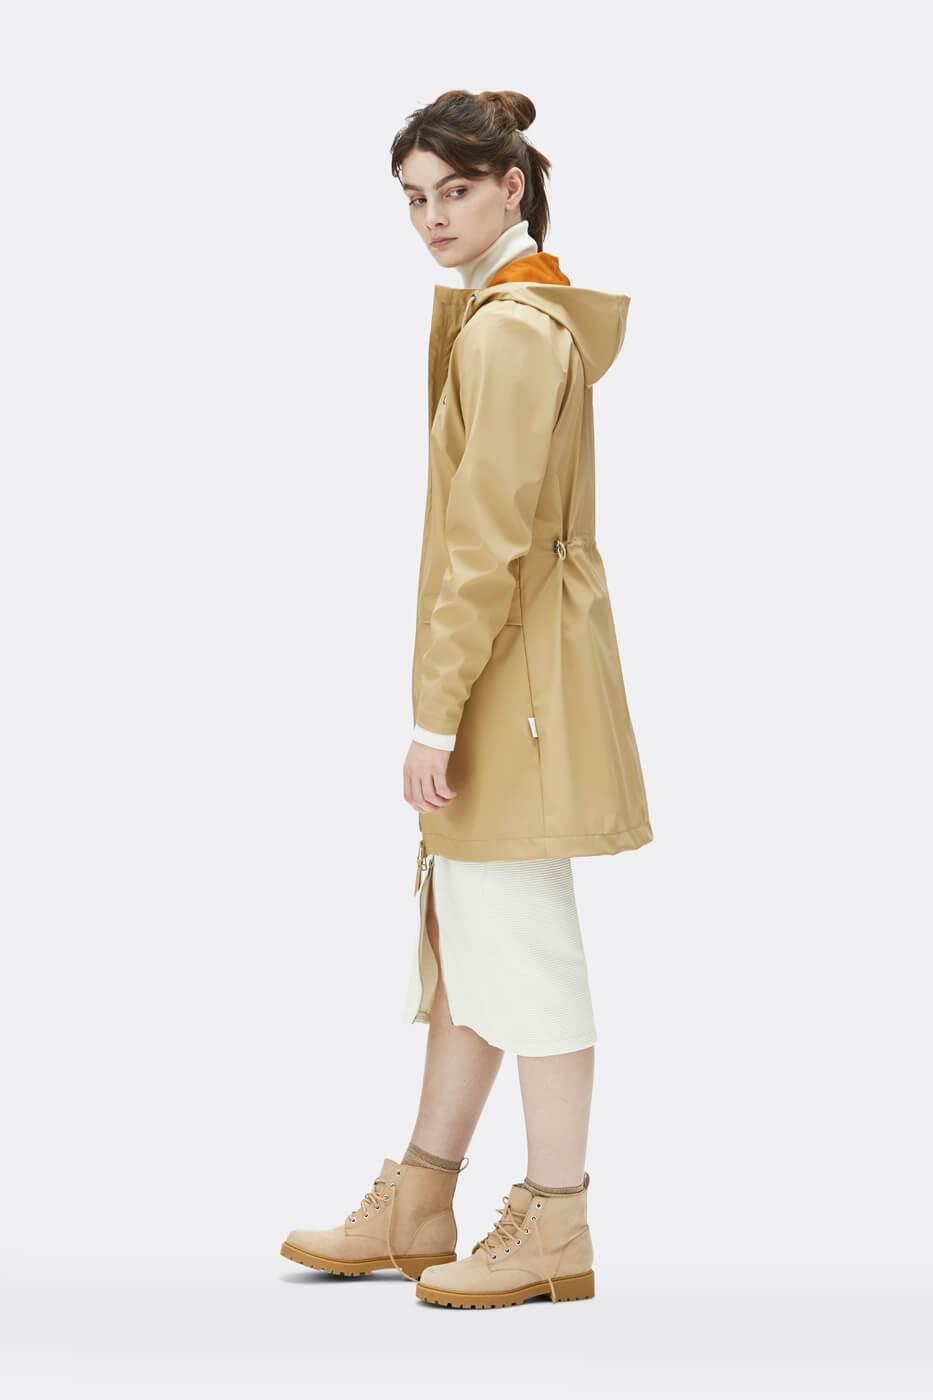 W_Coat-Jacket-1246_1400x1400.jpg